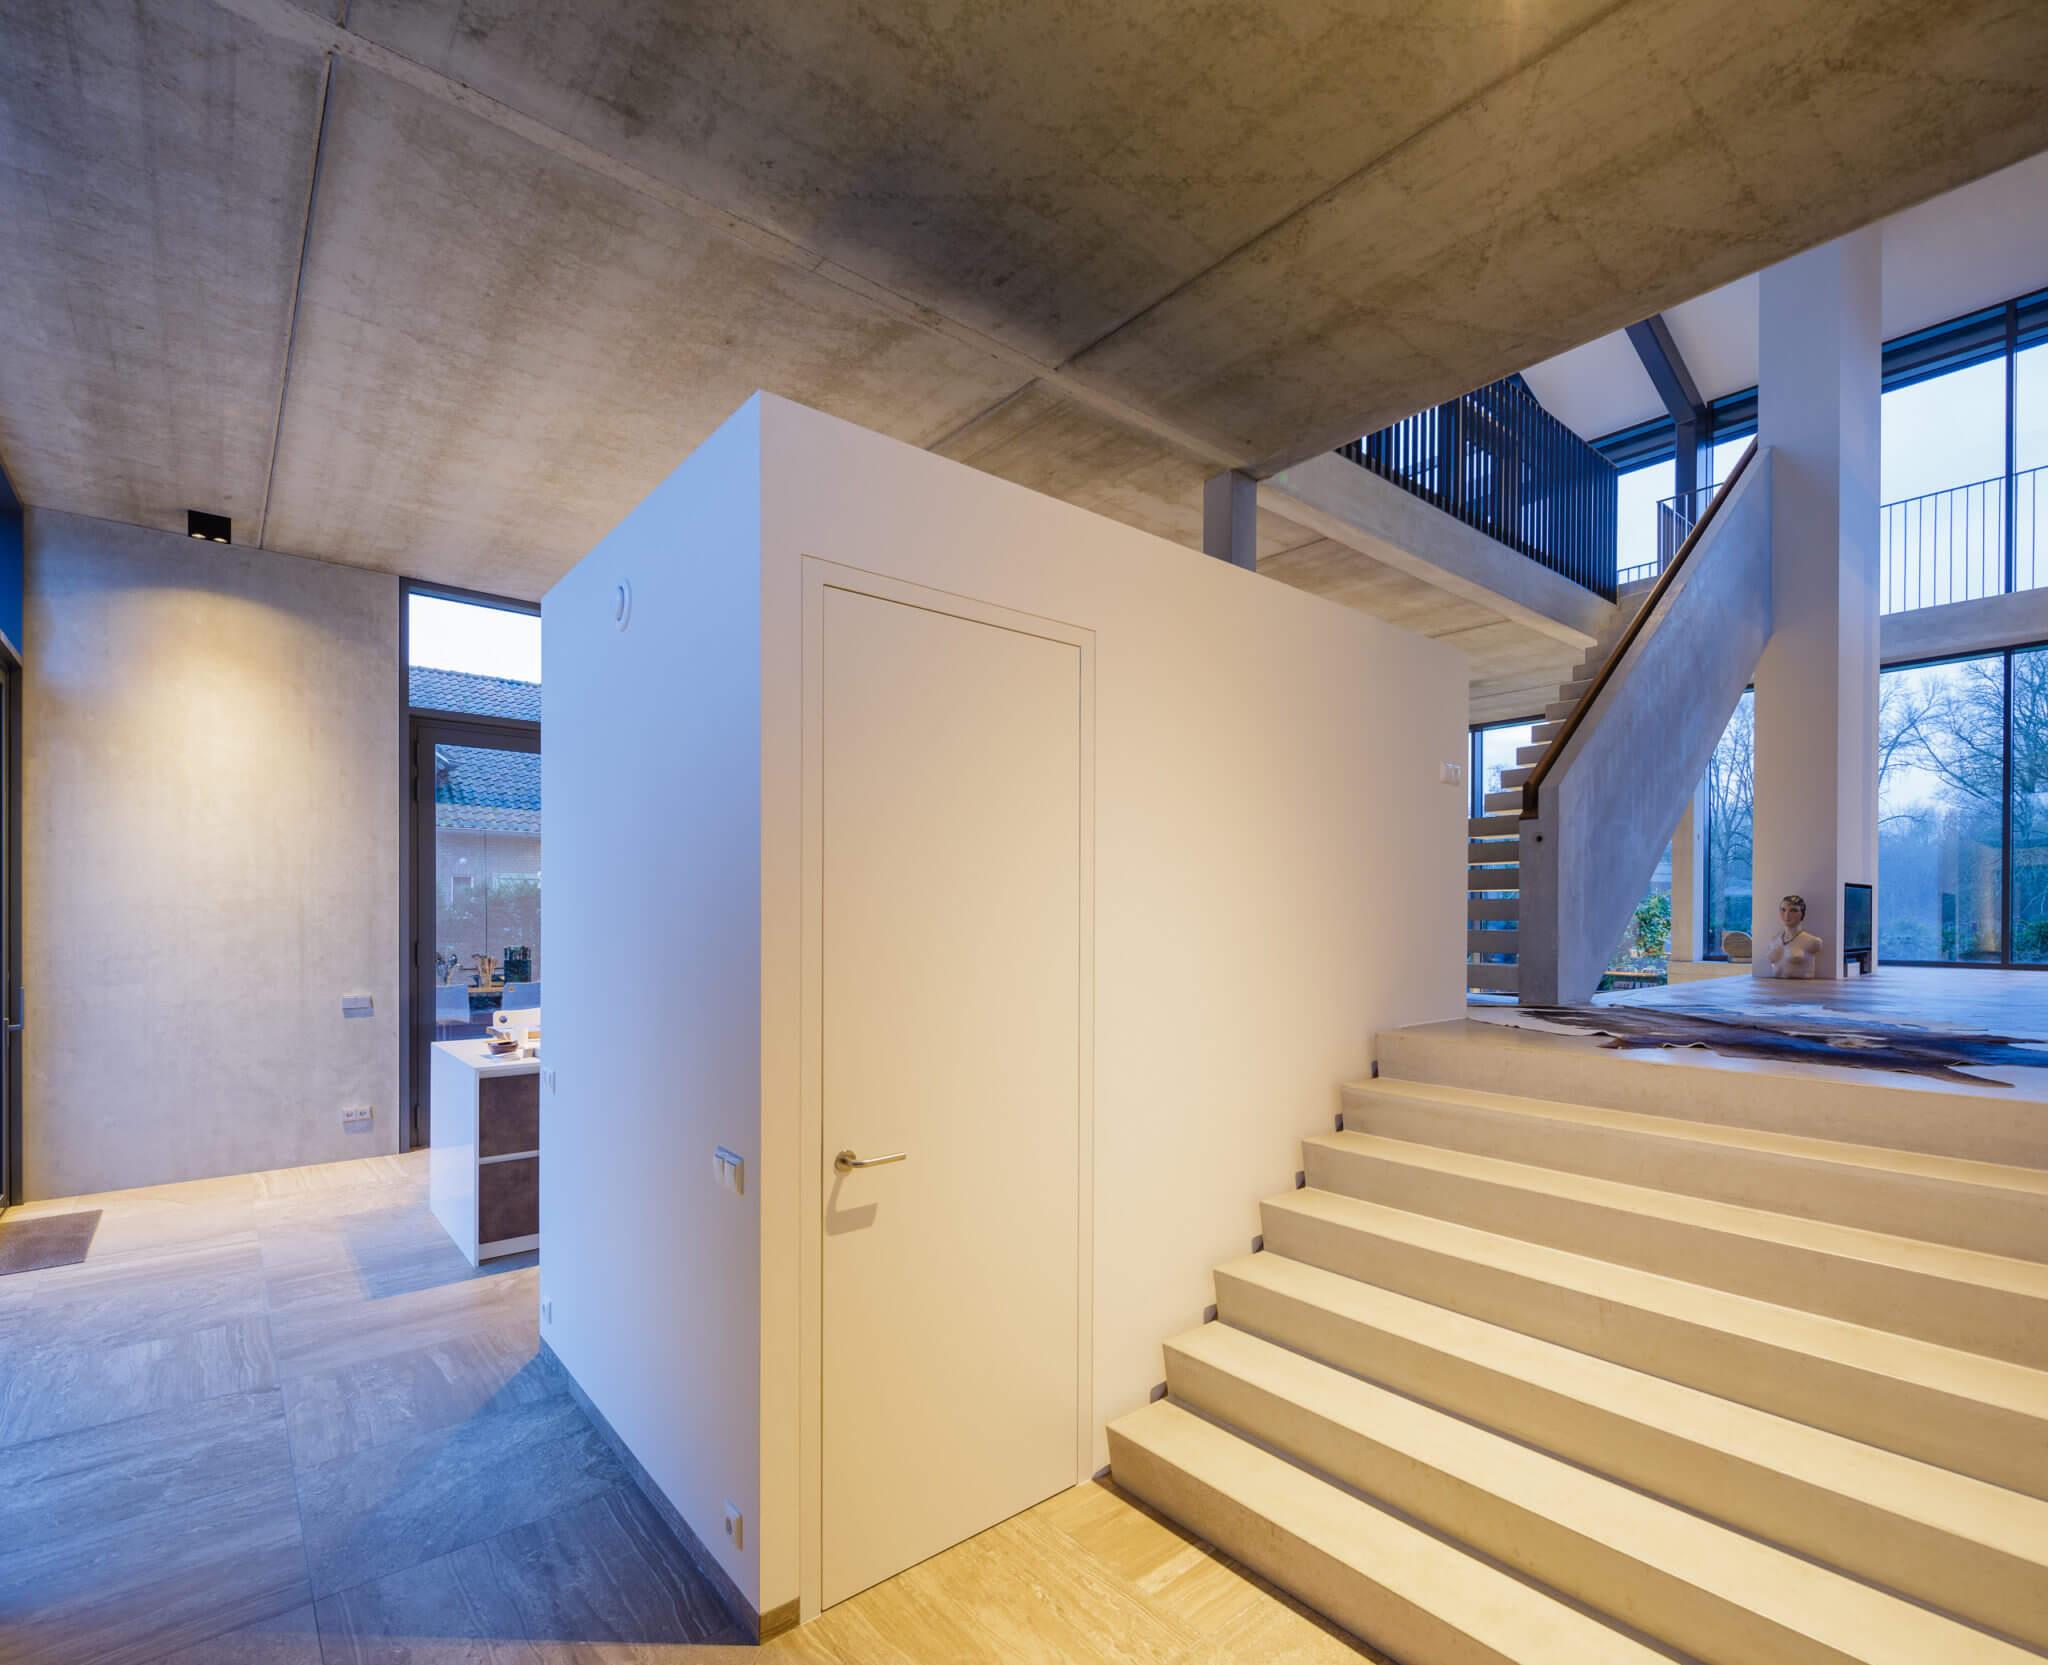 villa glazen glas Eindhoven Brainport huis Stadwandelpark praktijkruimte Elzent betonarchitectuur hanrath zadeldak vernieuwend vide showtrap PV-panelen indaks